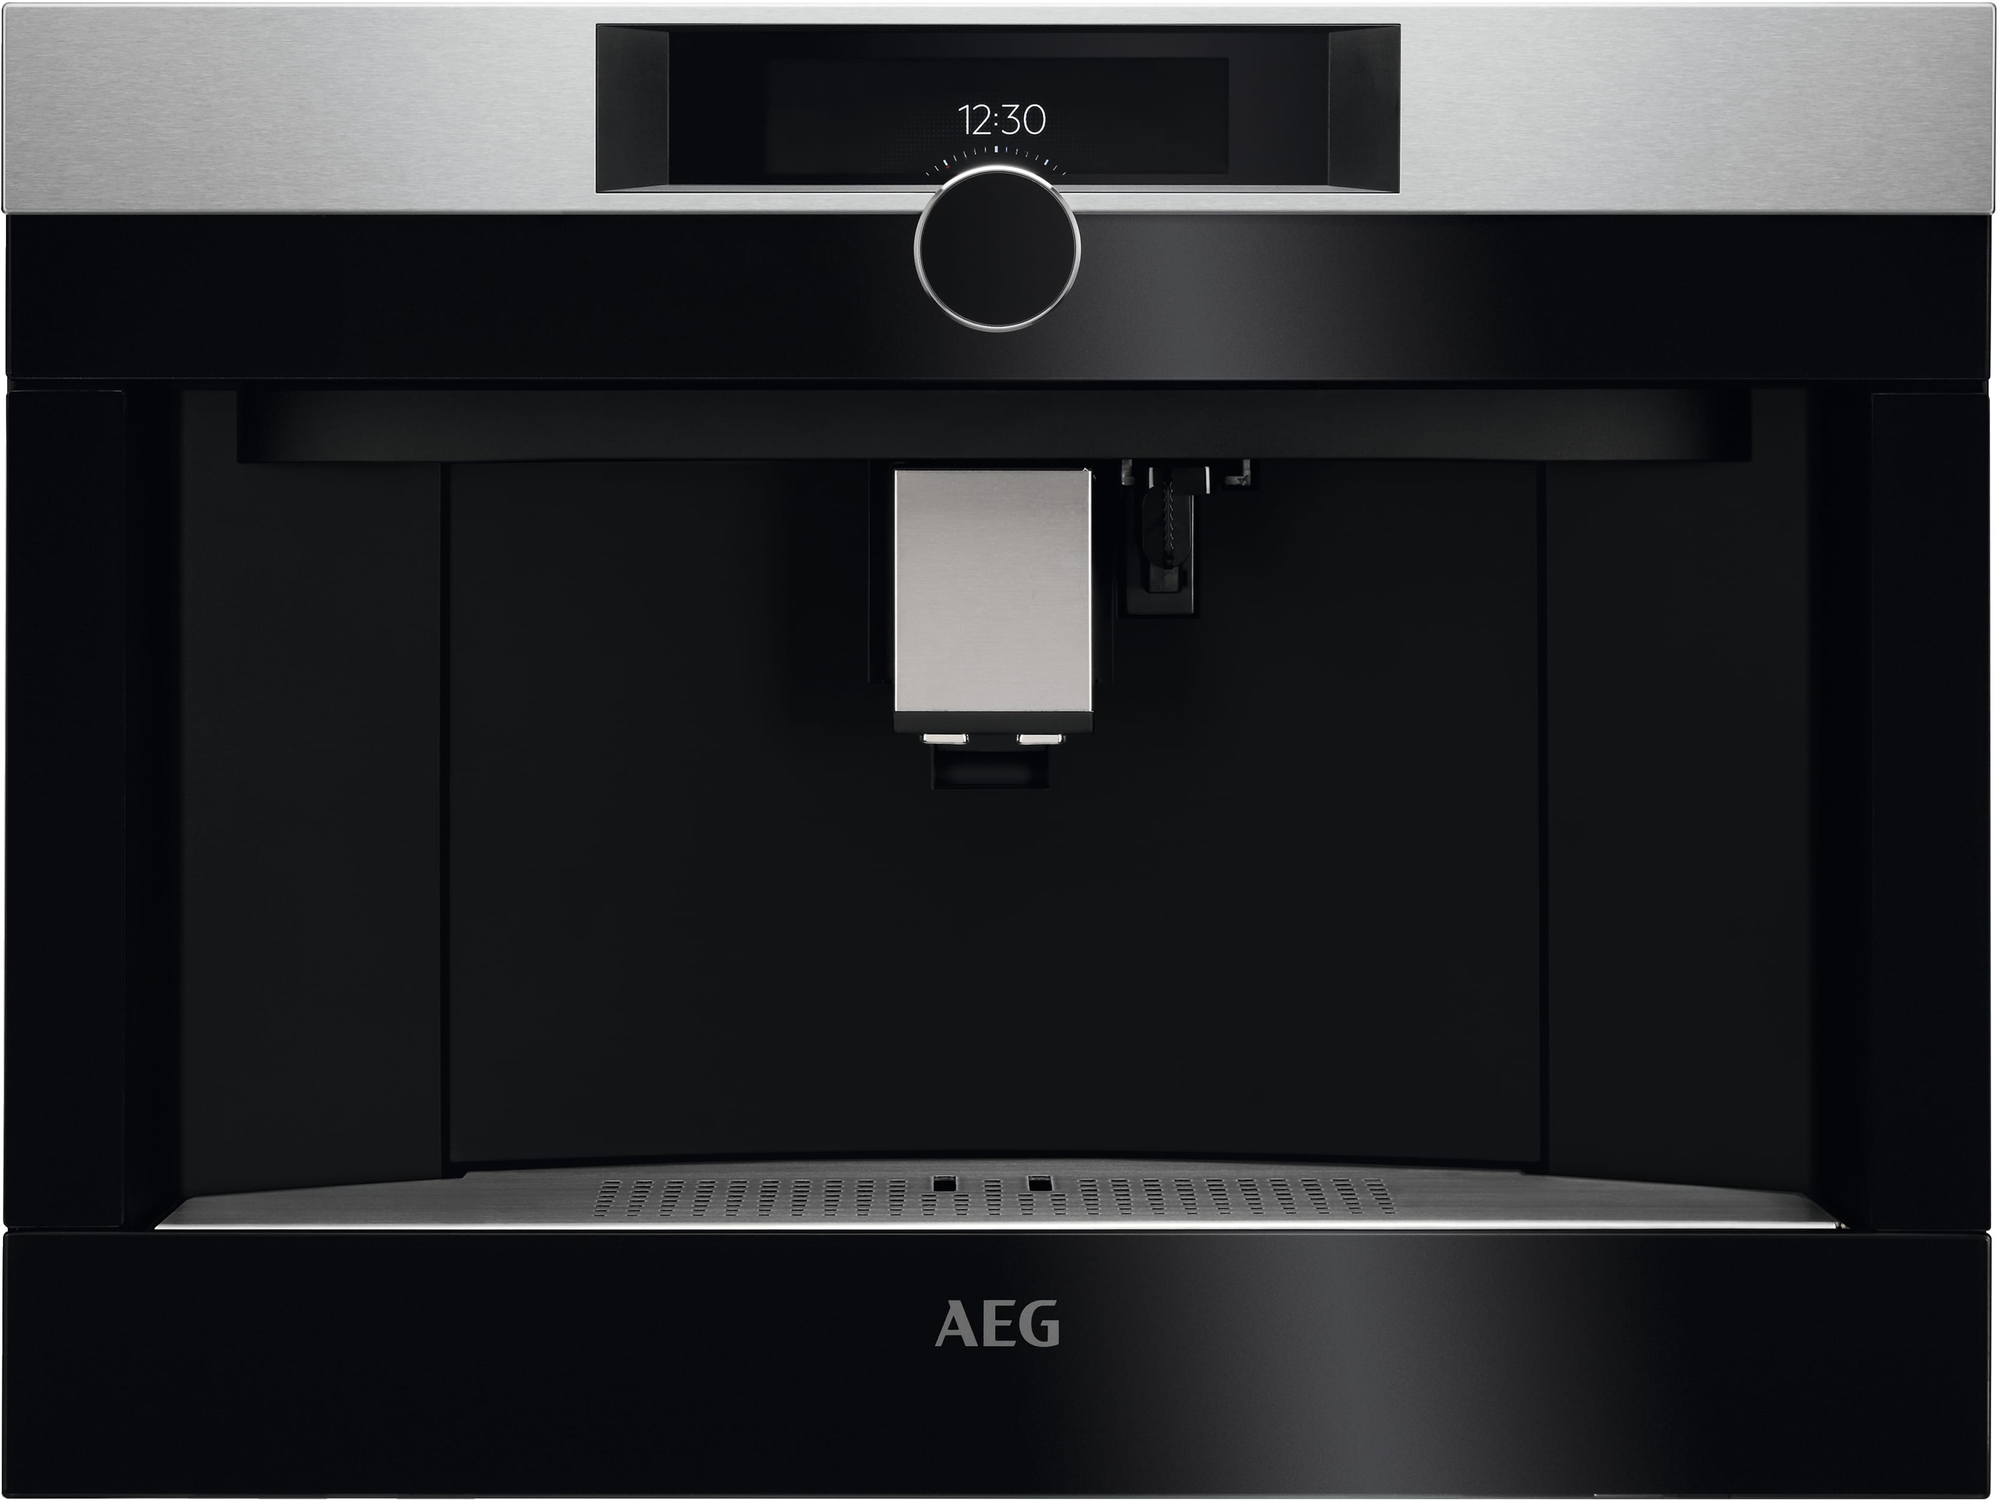 Integrated Coffee Machine